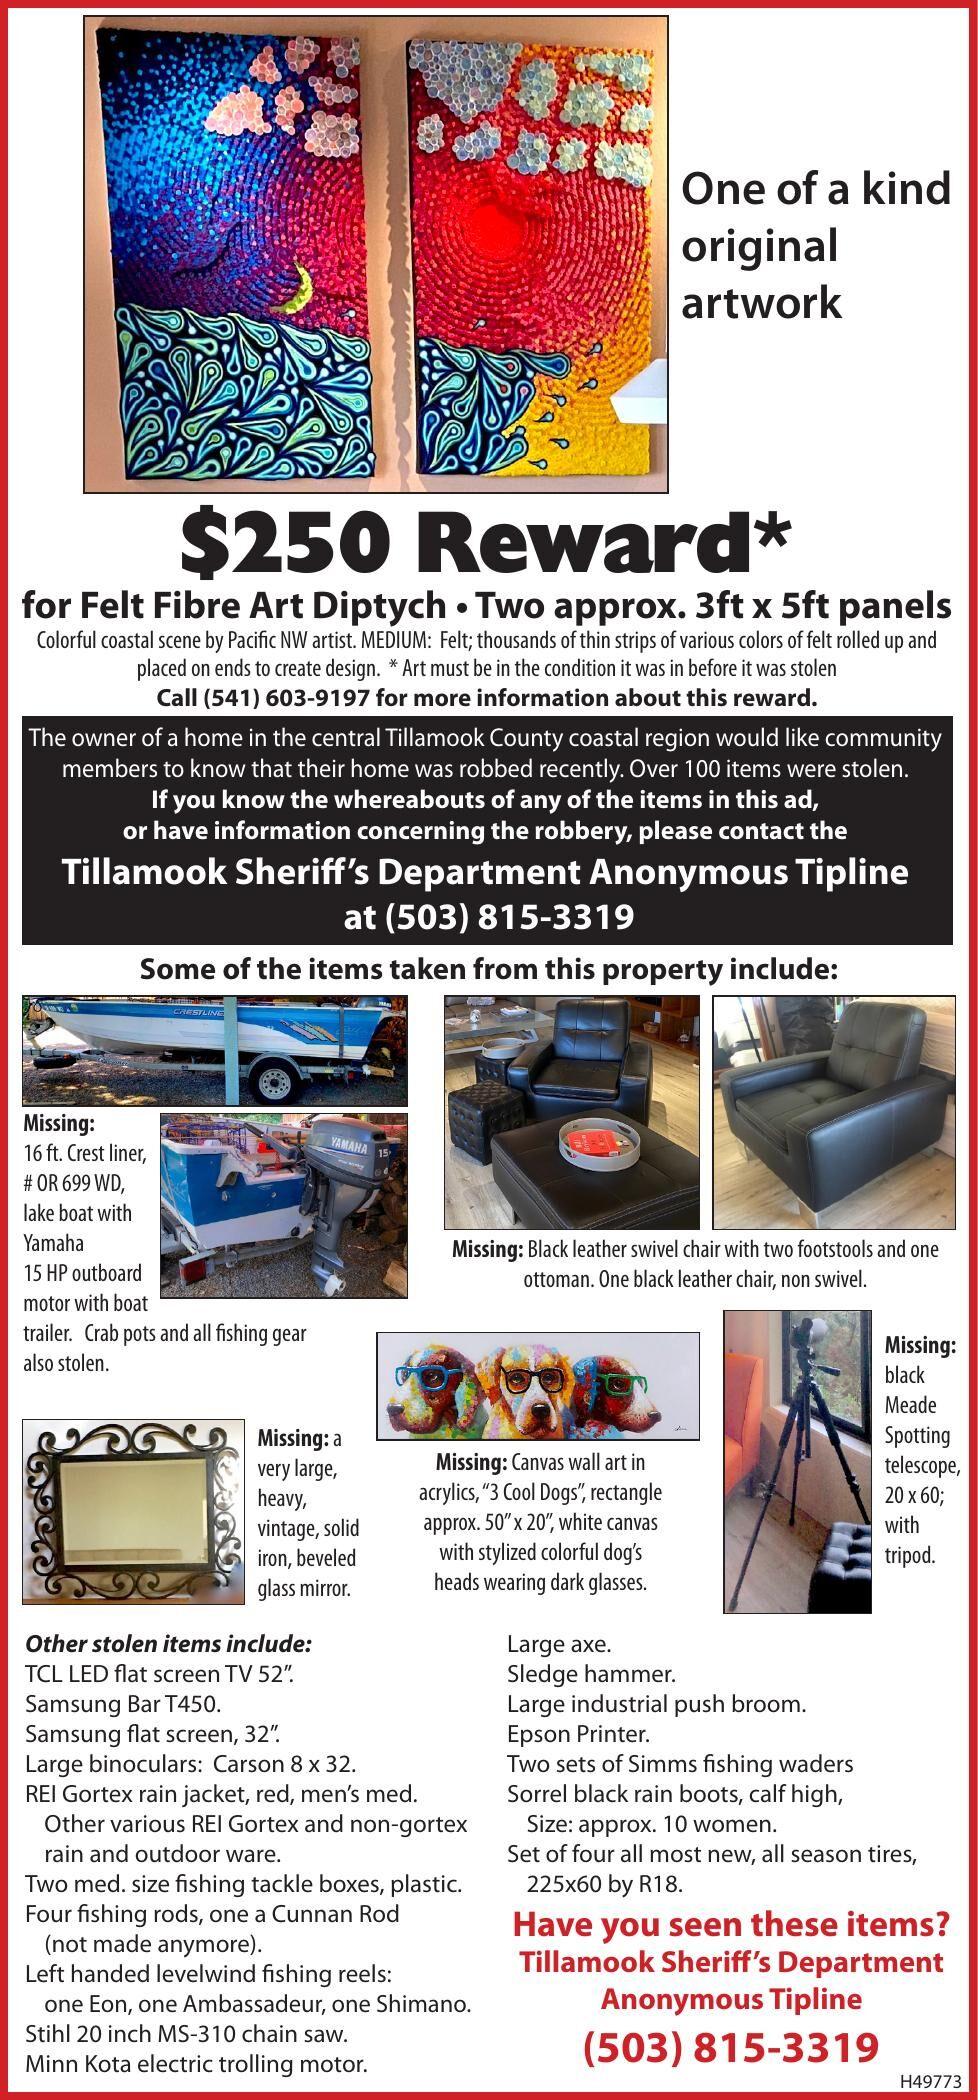 REWARD-Stolen Art Tillamook County 110420